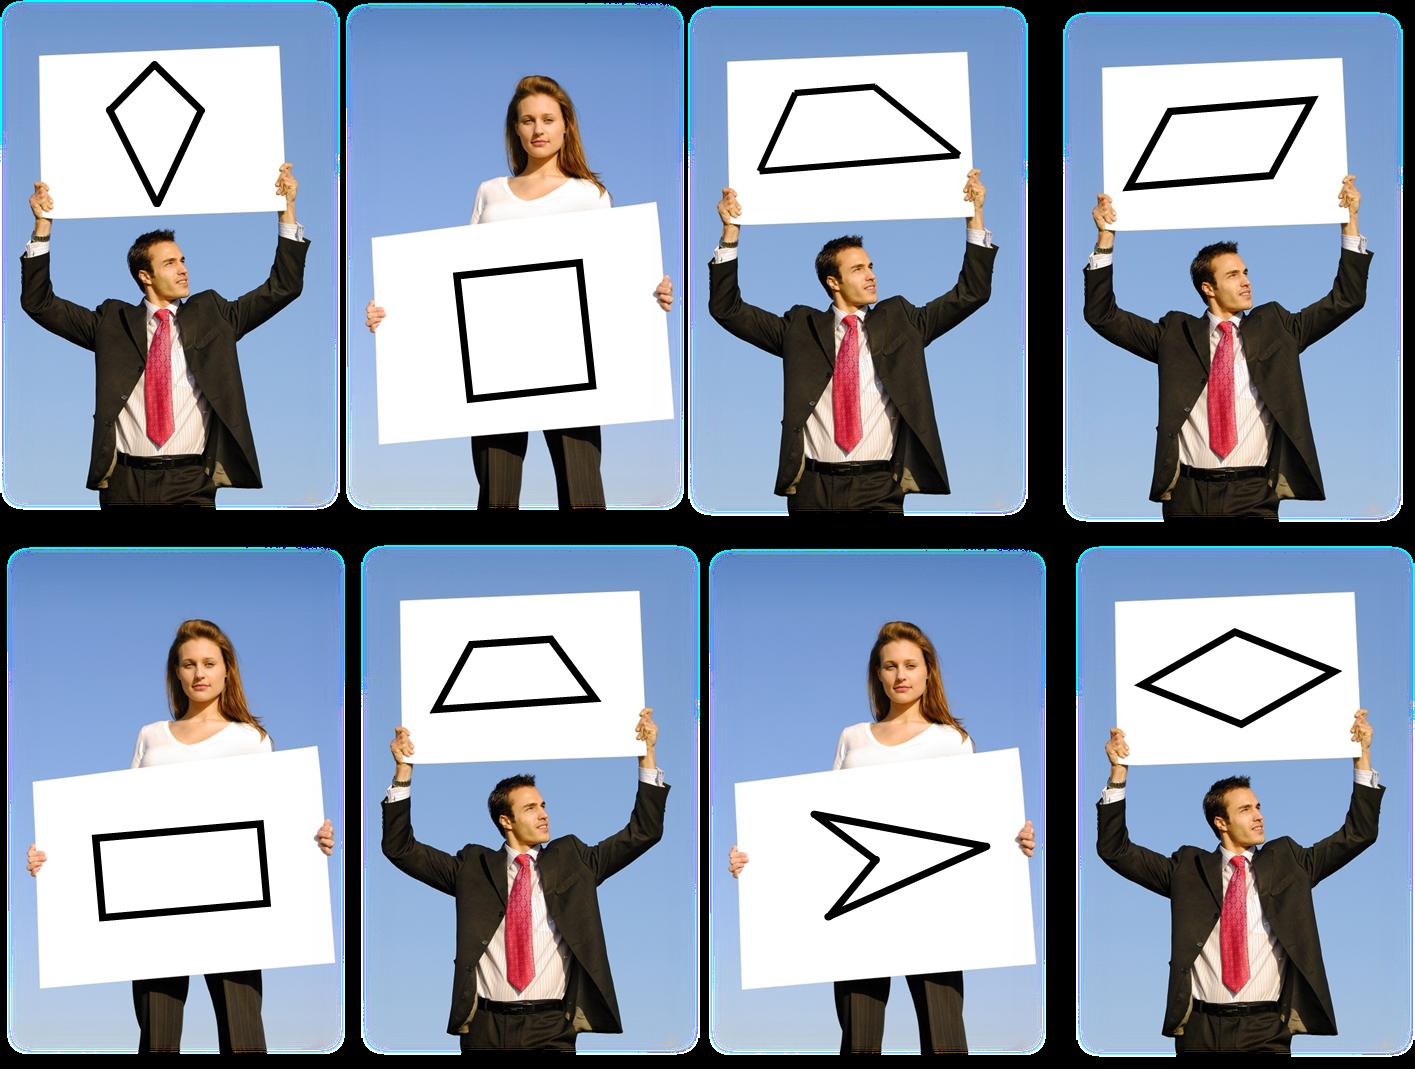 Median don steward mathematics. Square clipart quadrilateral shape